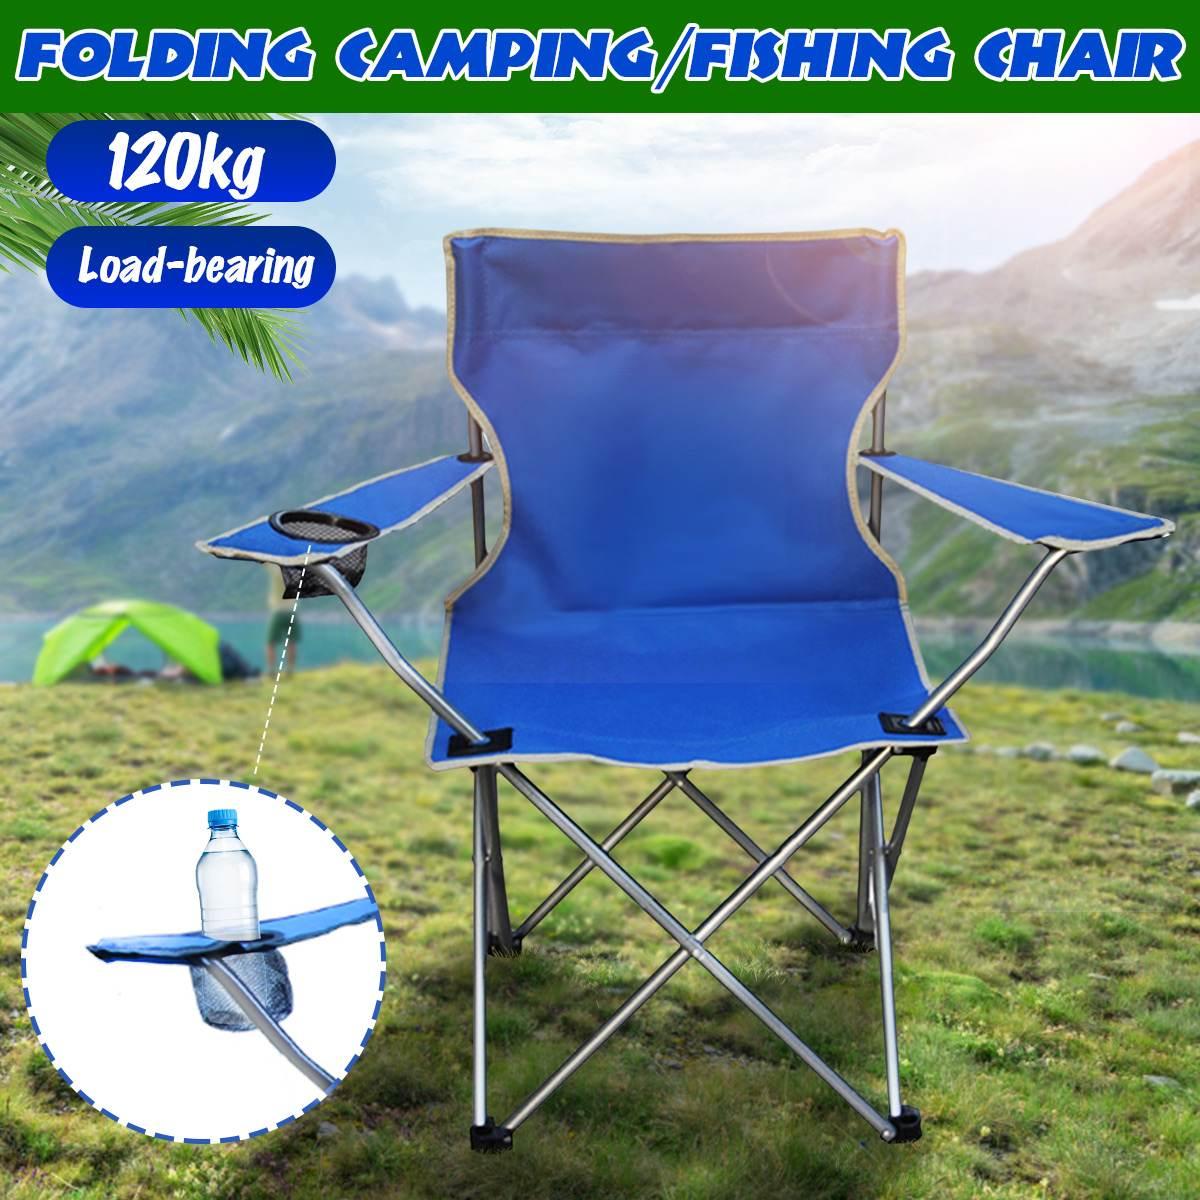 Light Folding Chair Camping Fishing Seat Portable Beach Garden Outdoor Camping Leisure Picnic Beach Chair Tool Bear 120kg